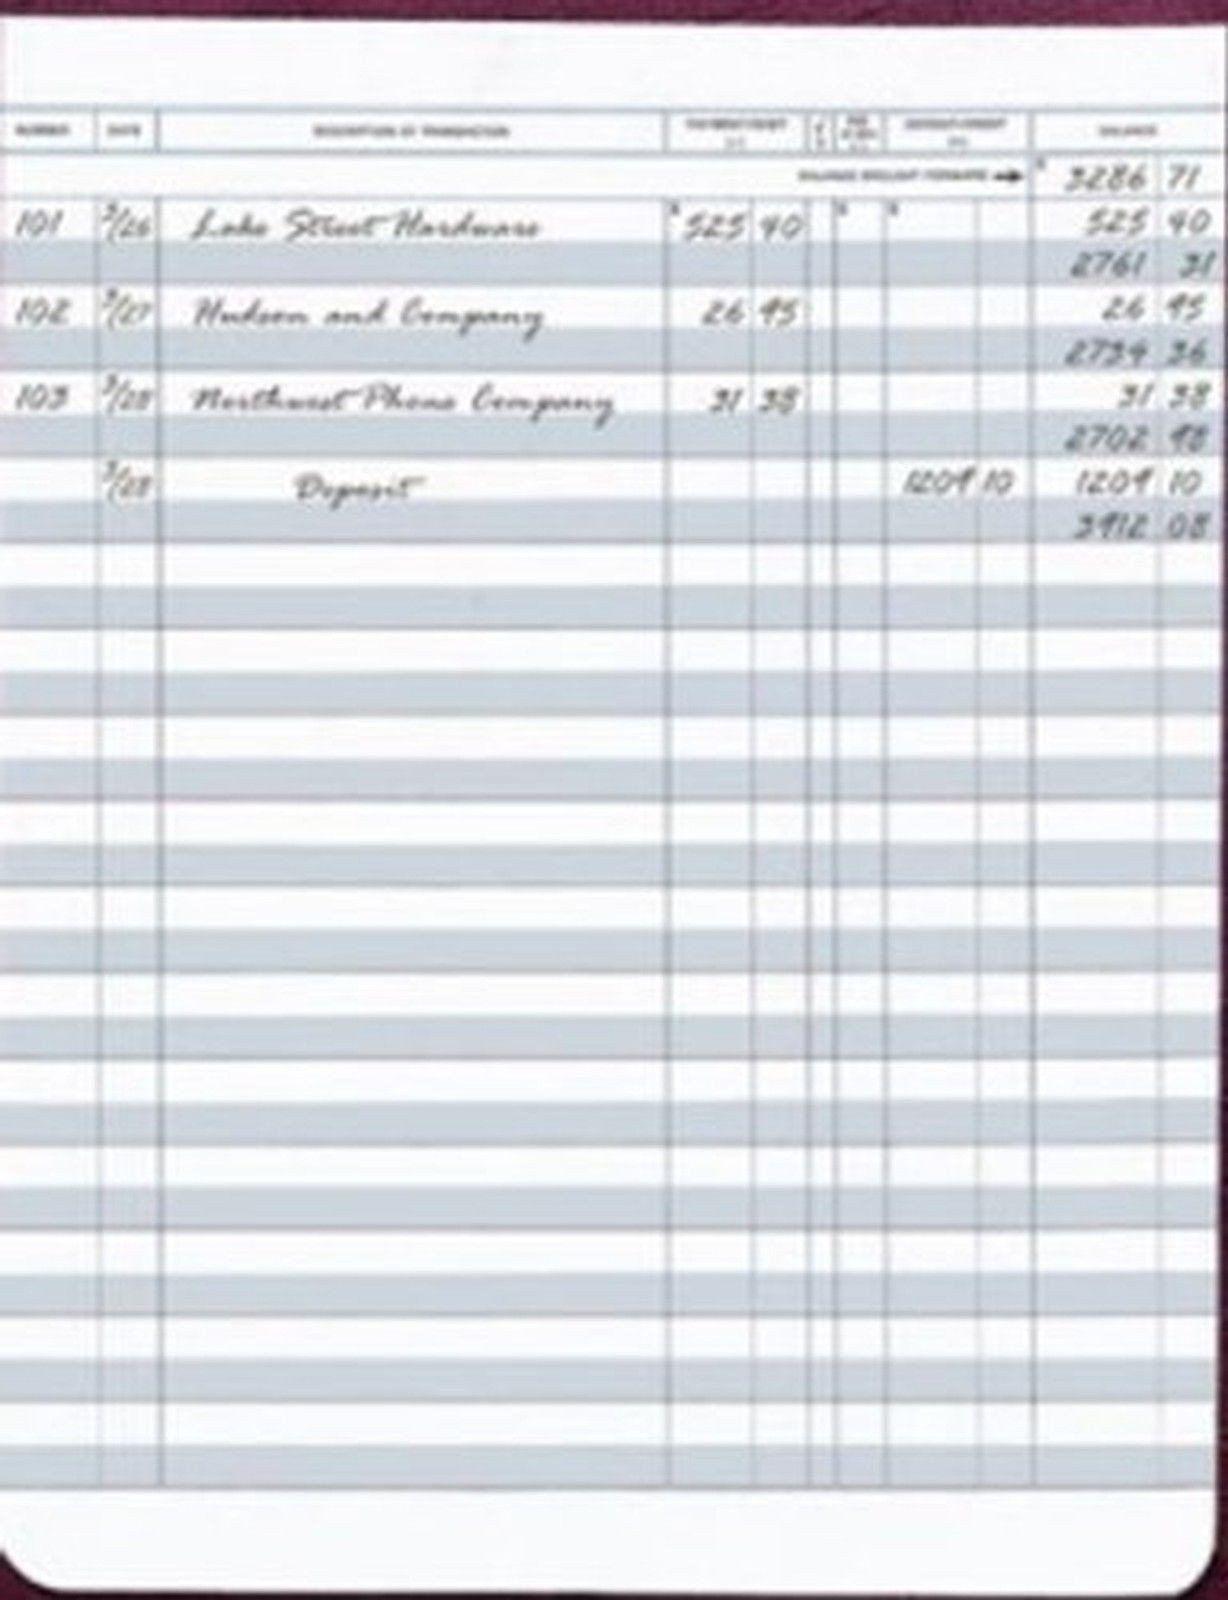 egp check registers for deskbook checks